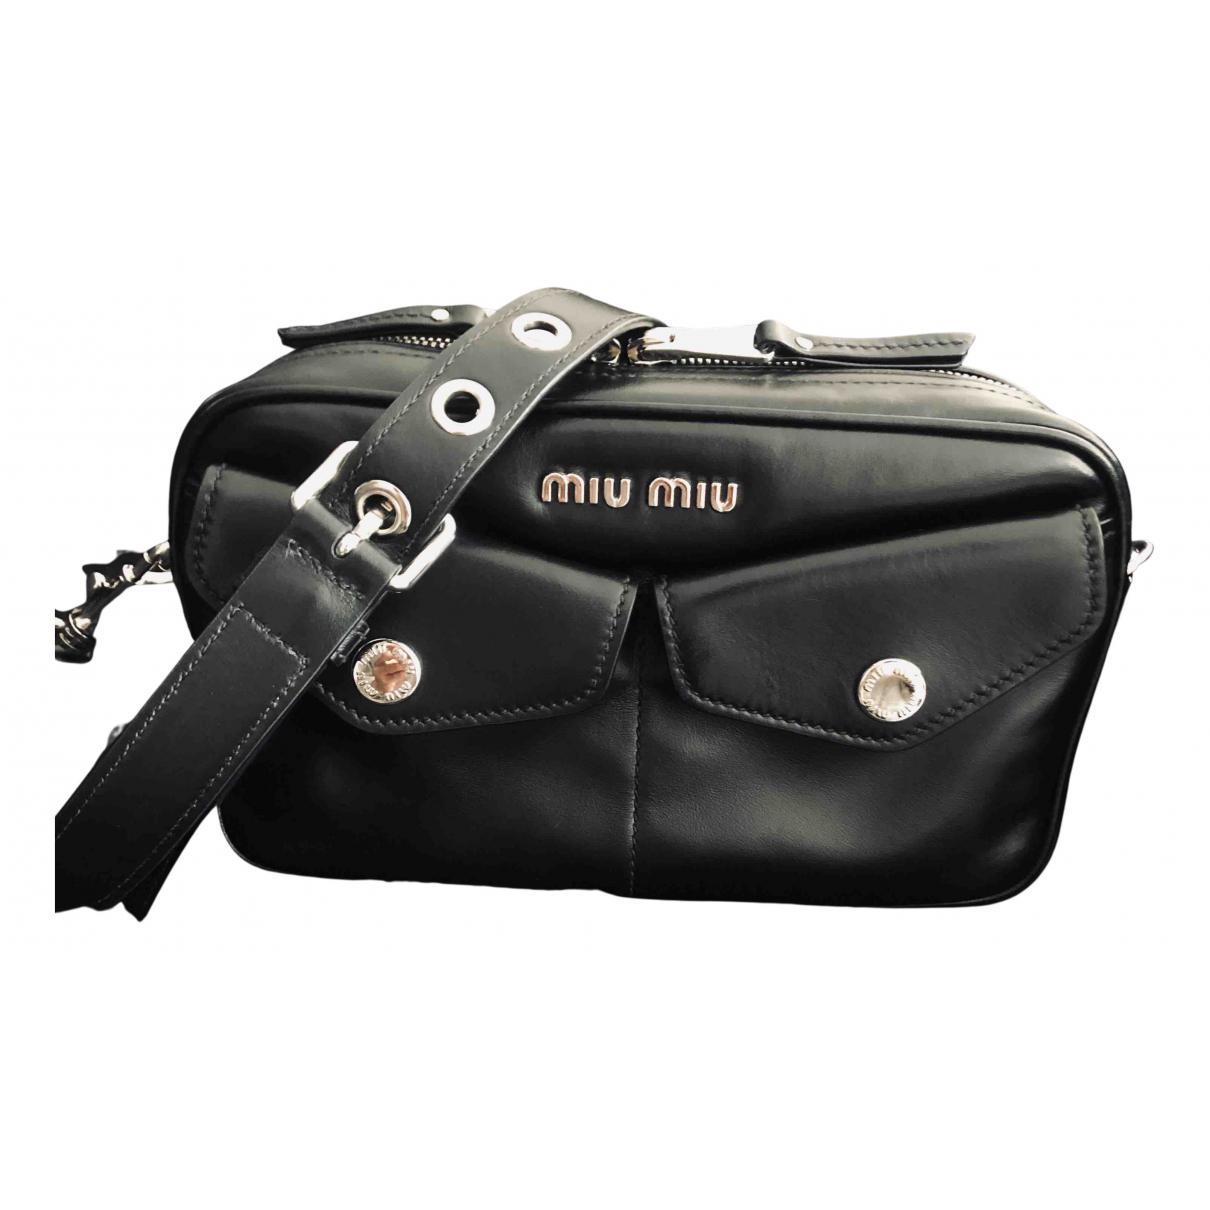 Miu Miu - Sac a main   pour femme en cuir - noir